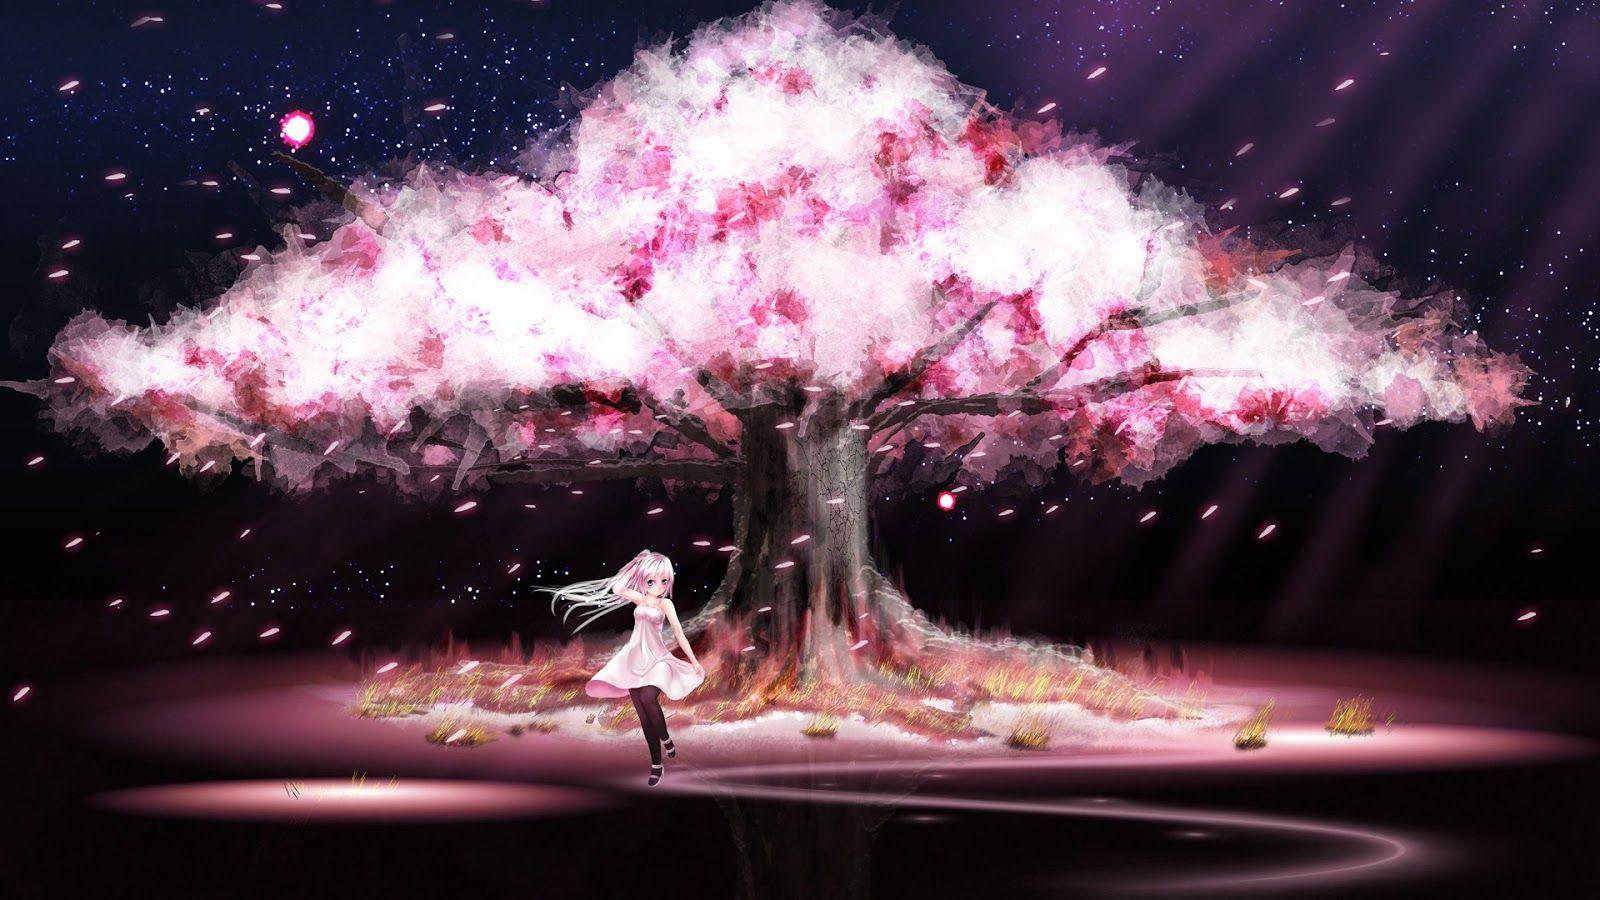 anime scenery wallpaper 1920x1080